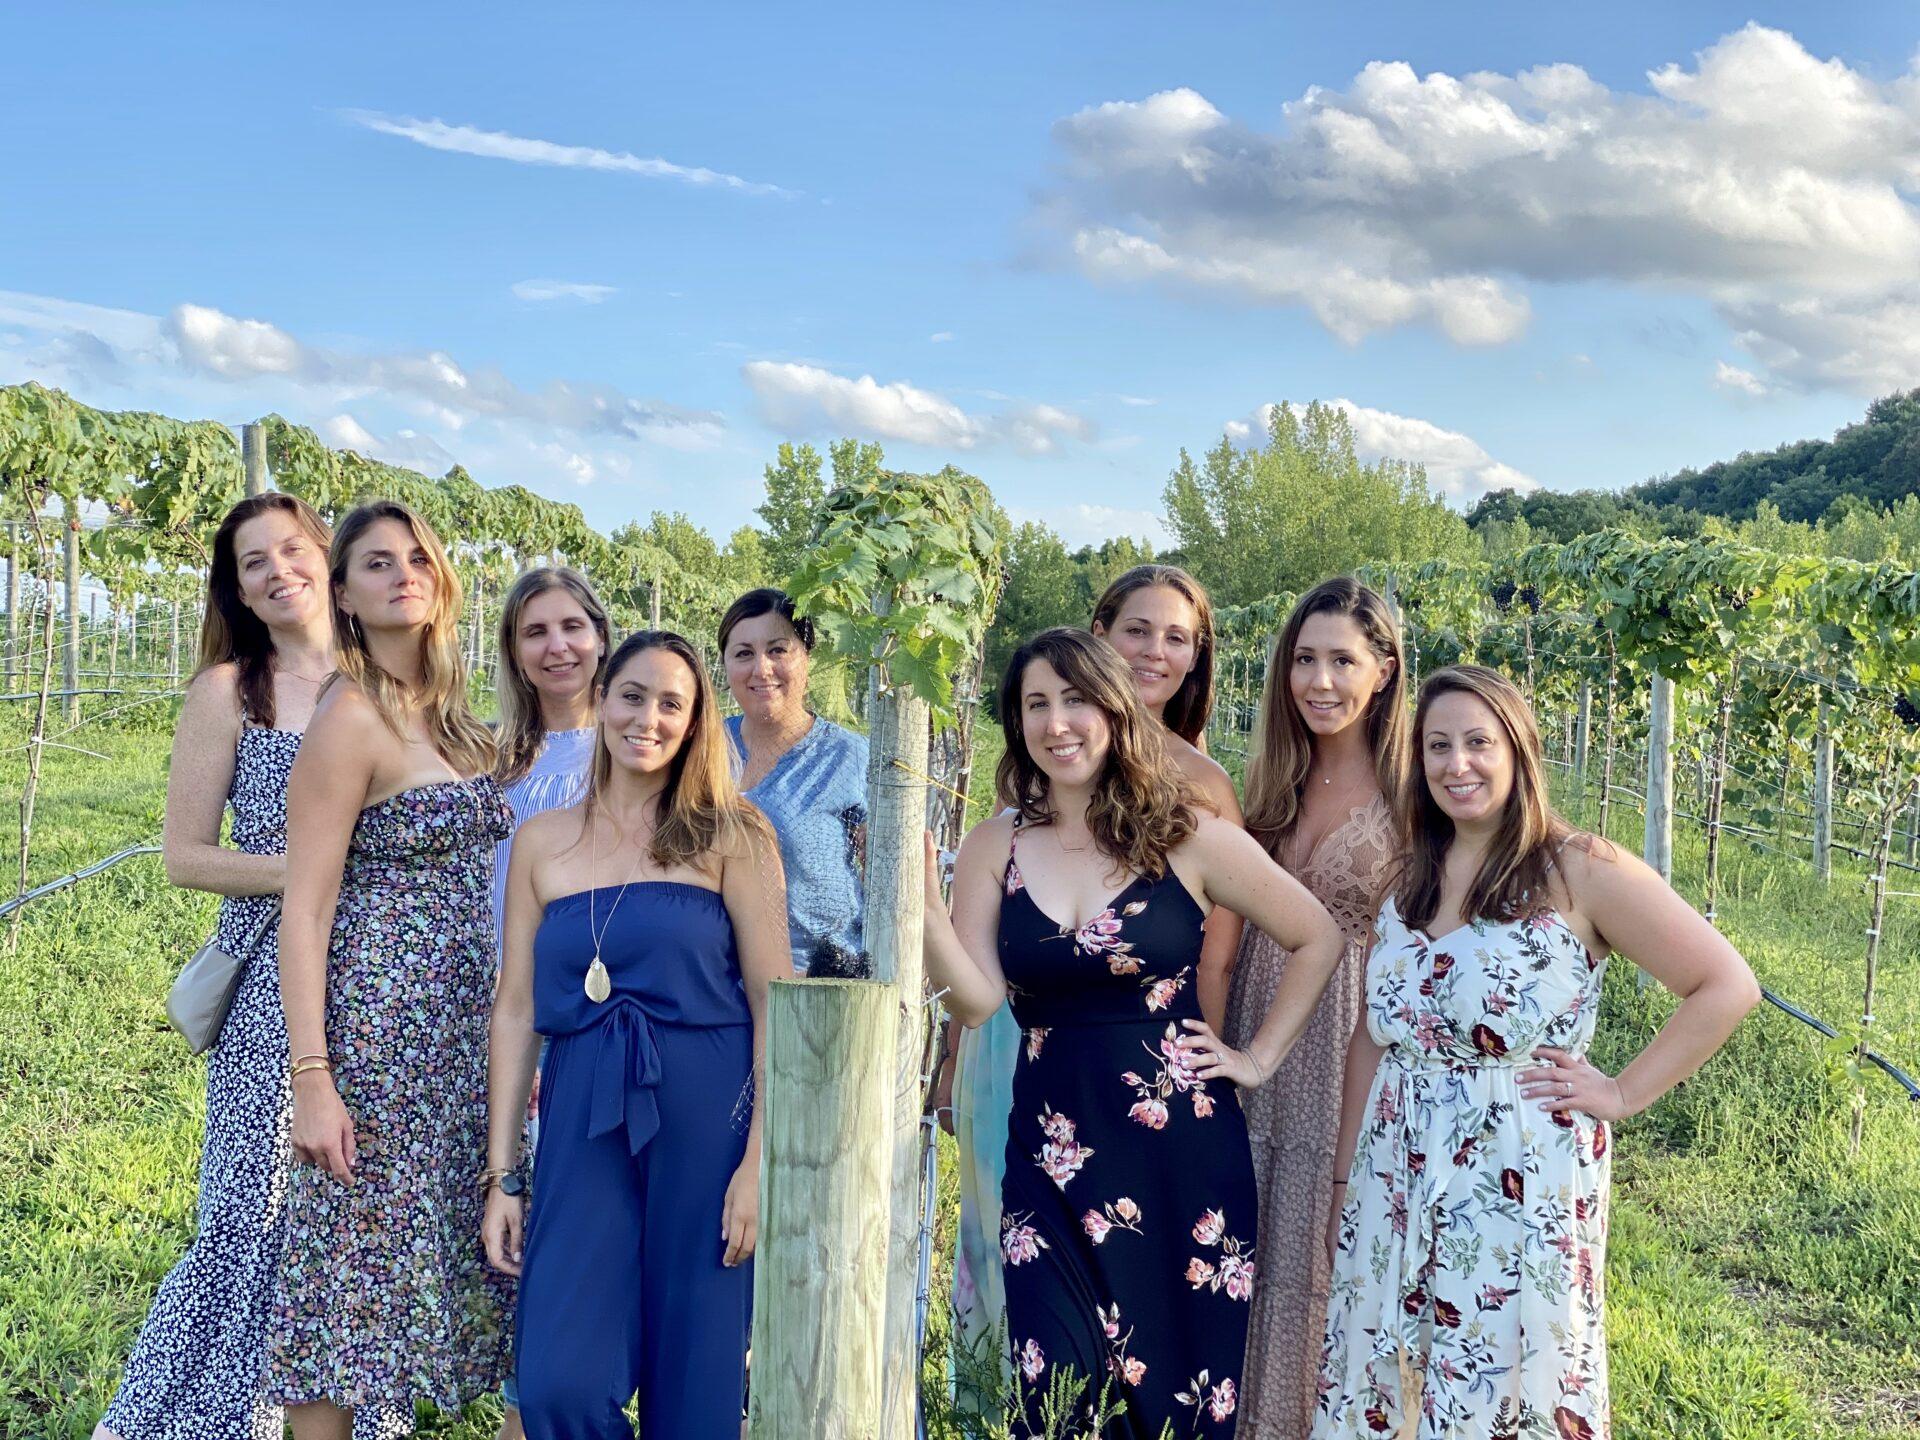 Nostrano Vineyards, Hudson Valley, New York